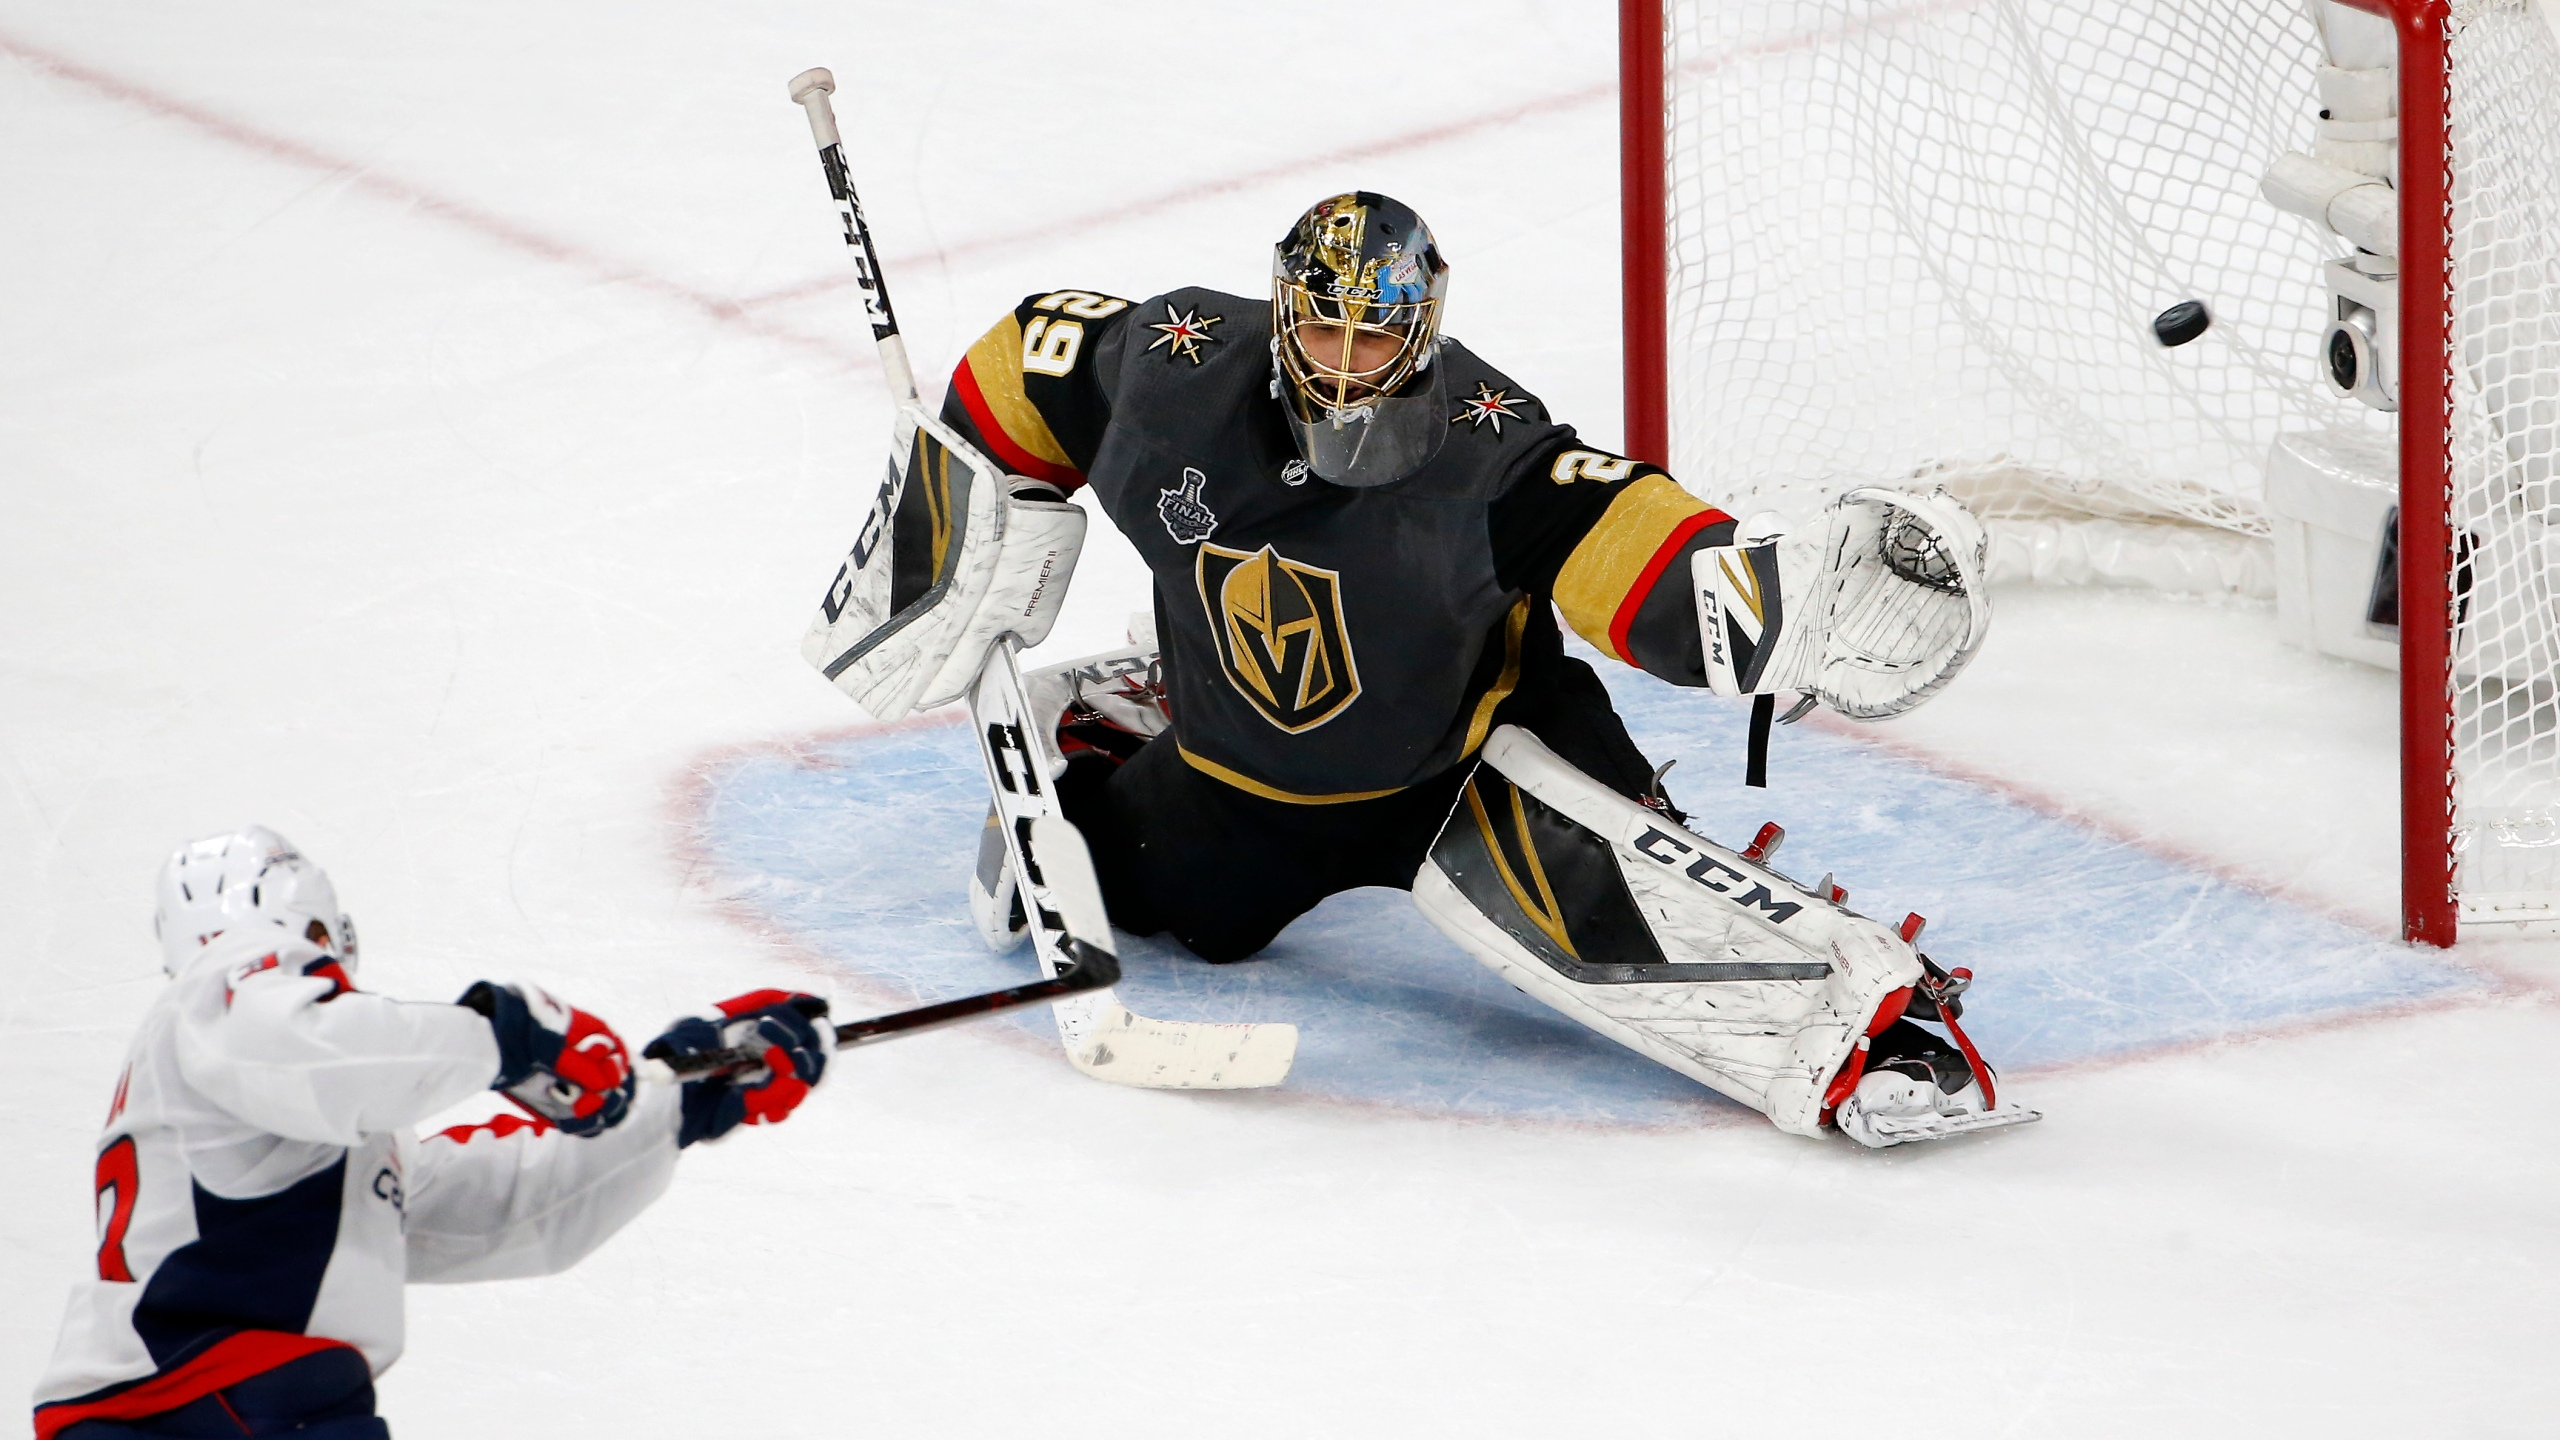 Stanley_Cup_Capitals_Hockey_58246-159532.jpg98912102